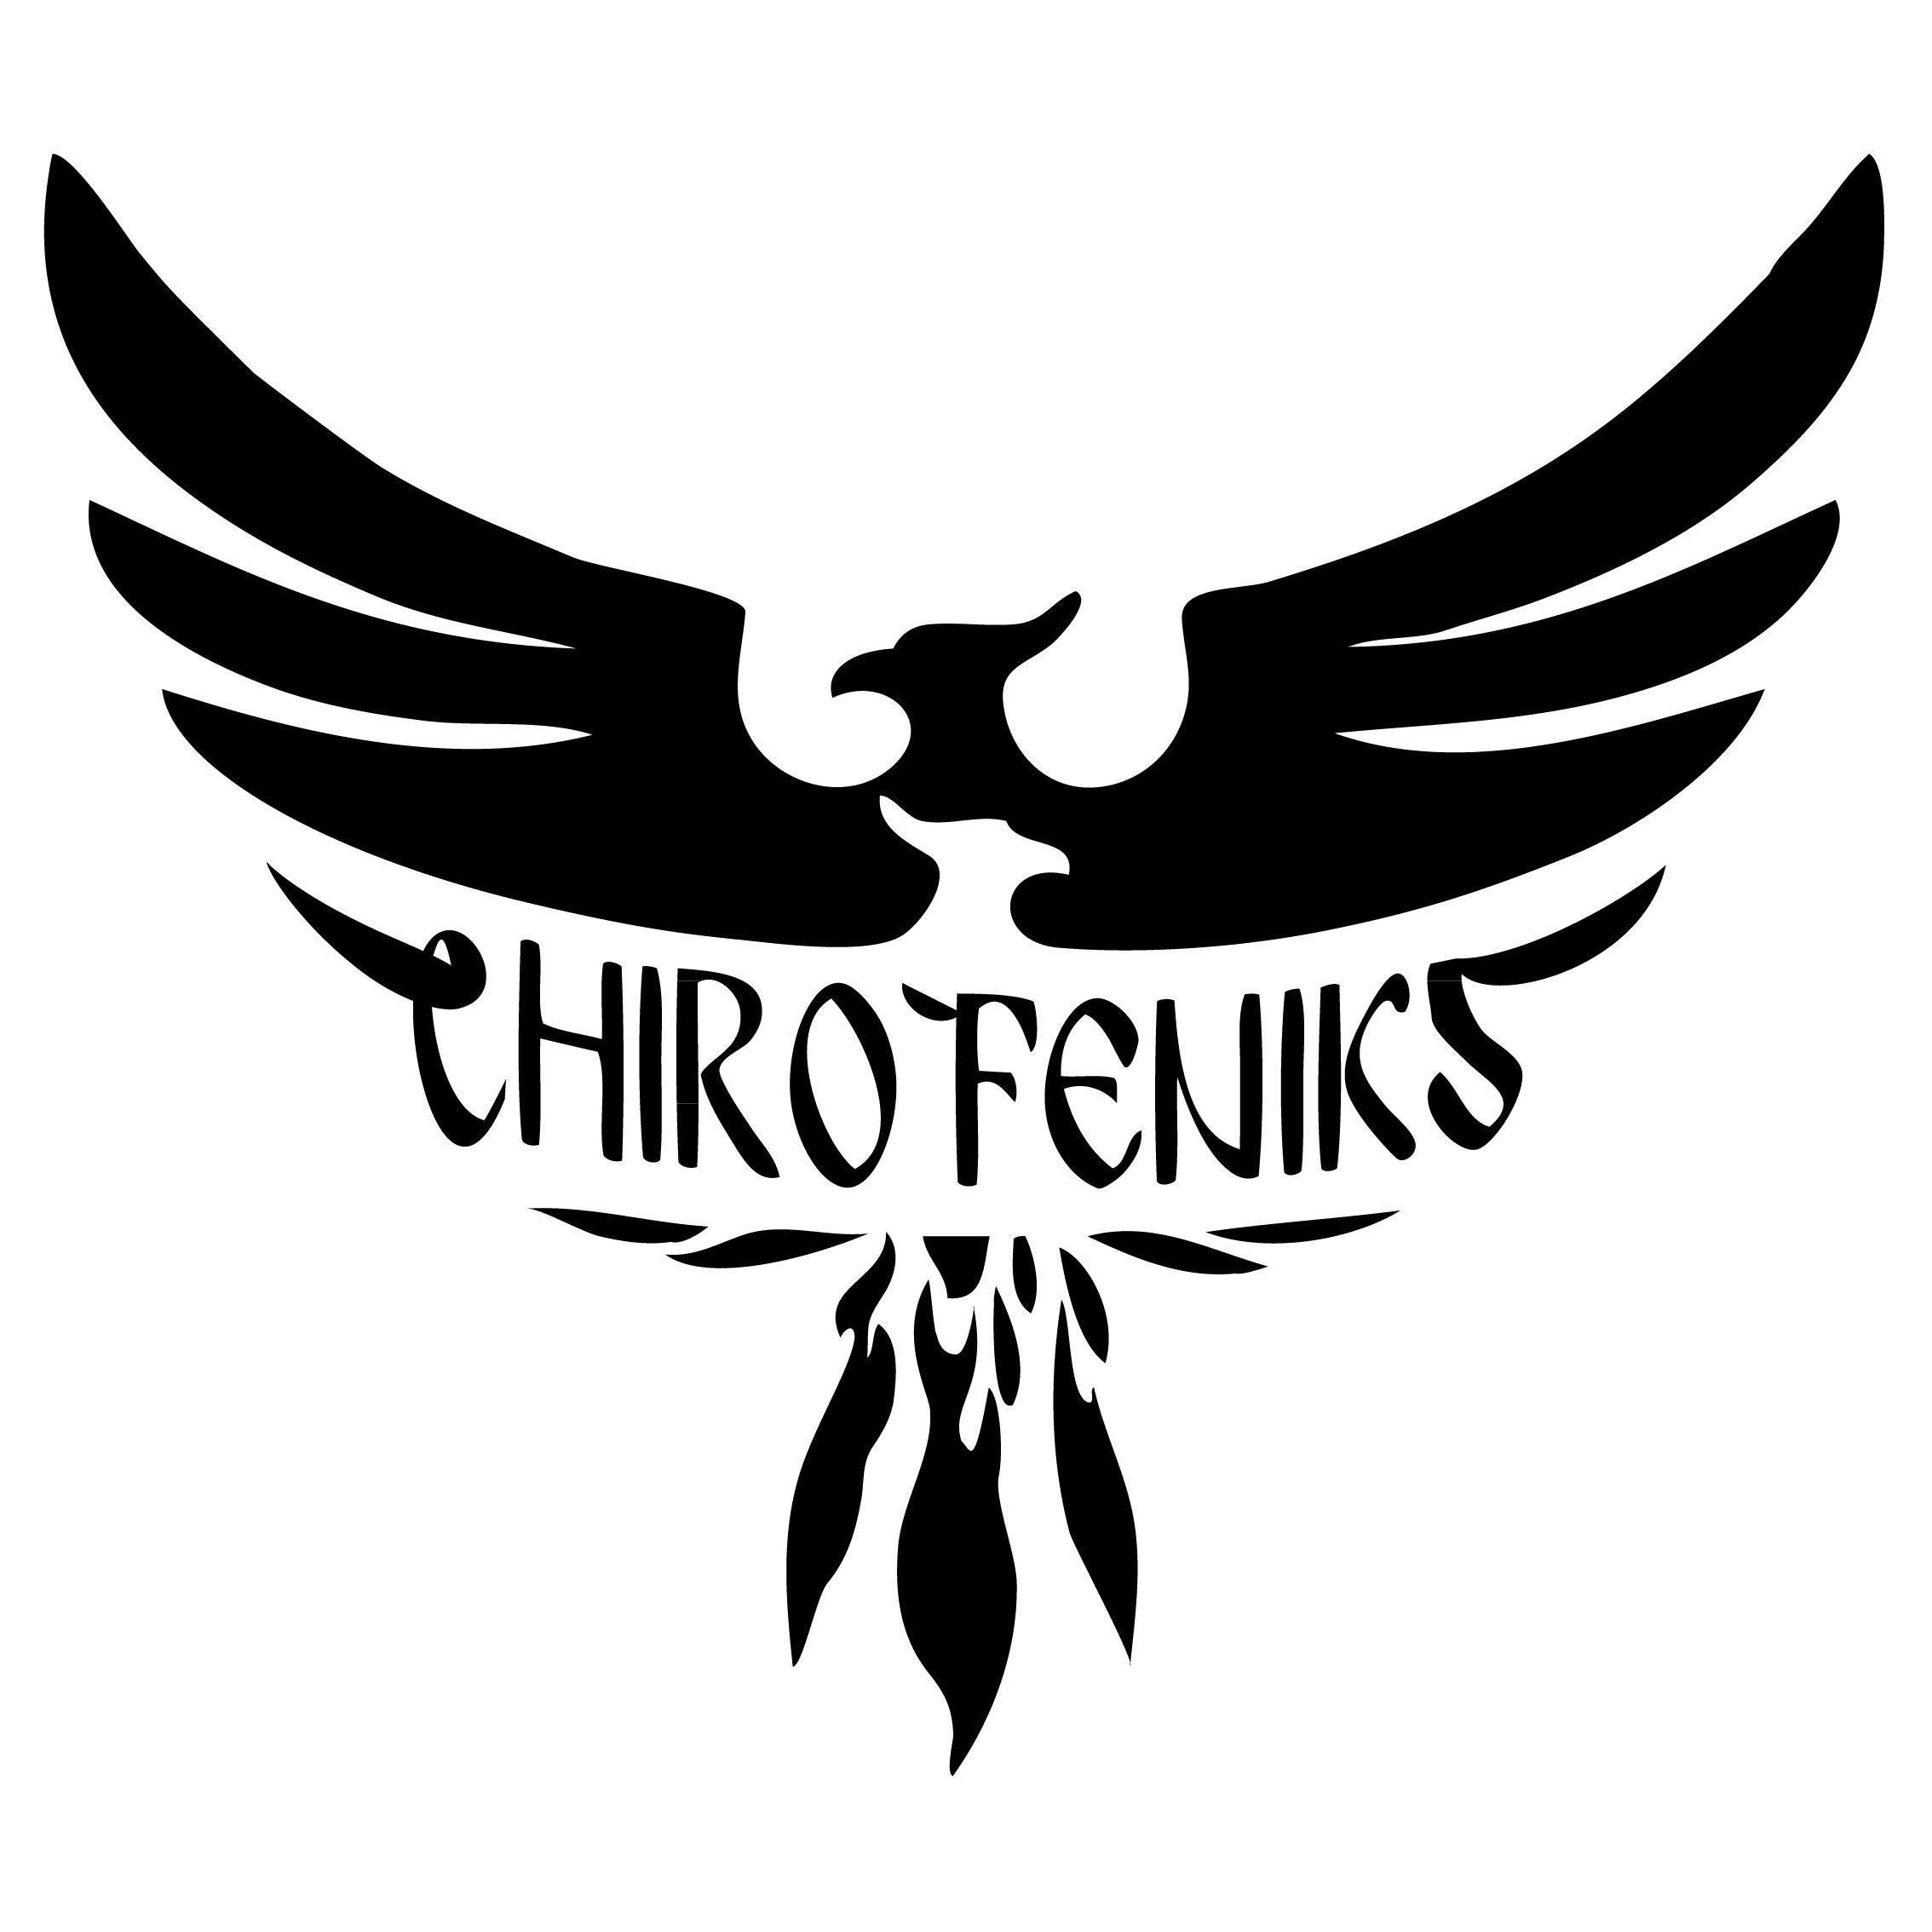 Chiro Feniks